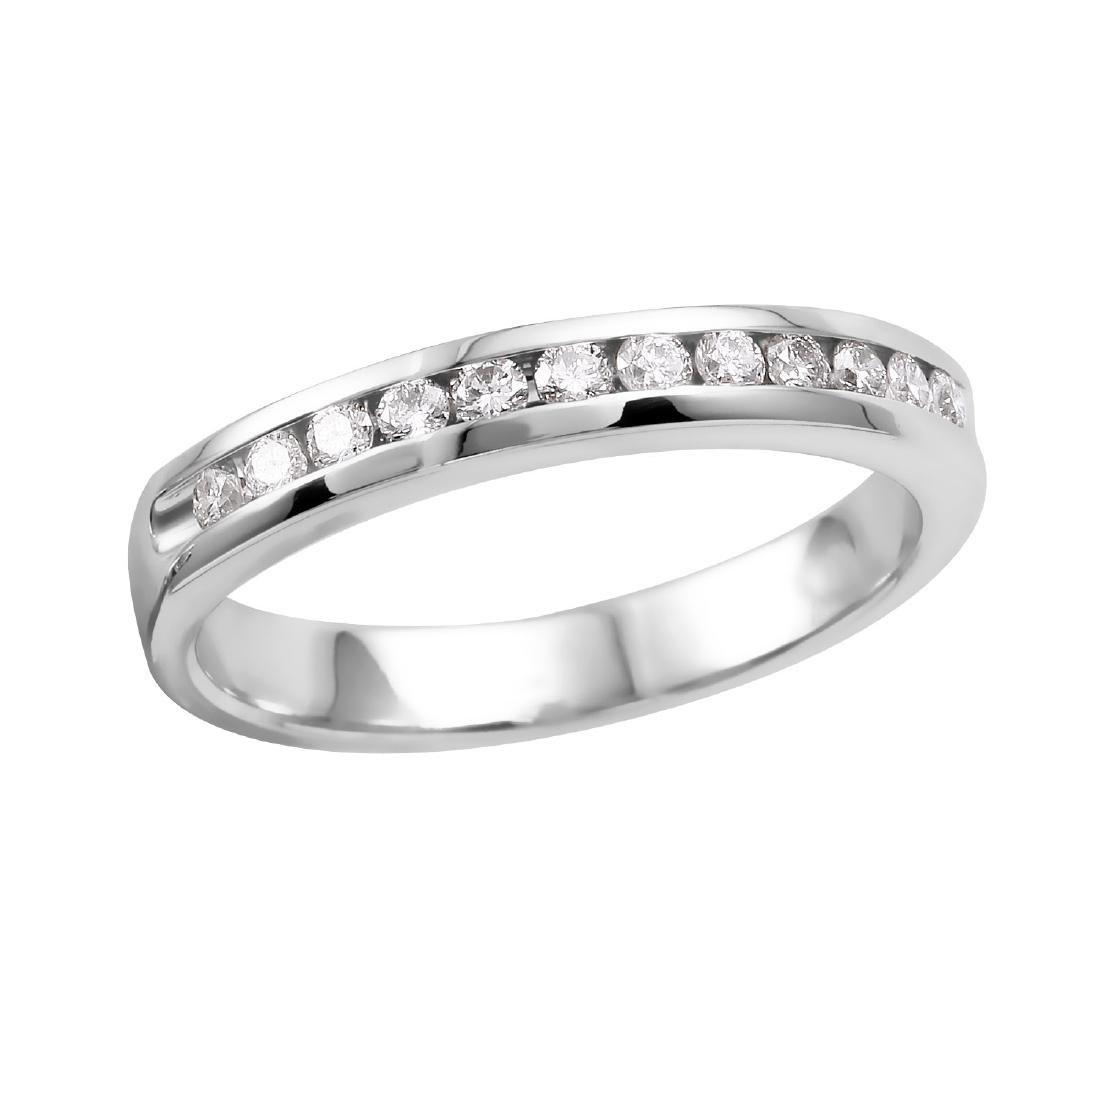 14KT White Gold Diamond Wedding Band